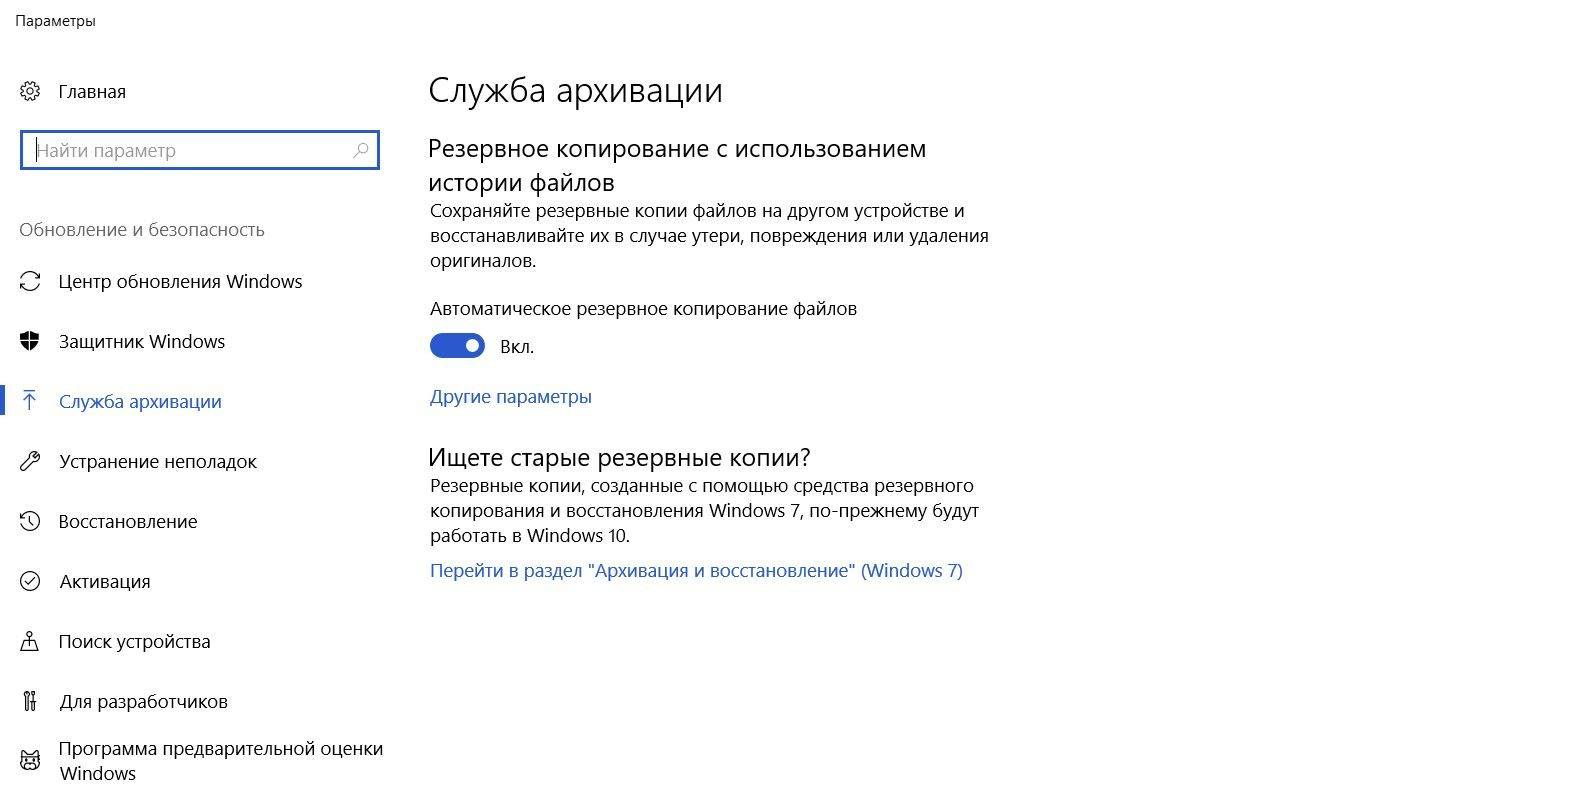 1_1512825084-e1512825102336.jpg